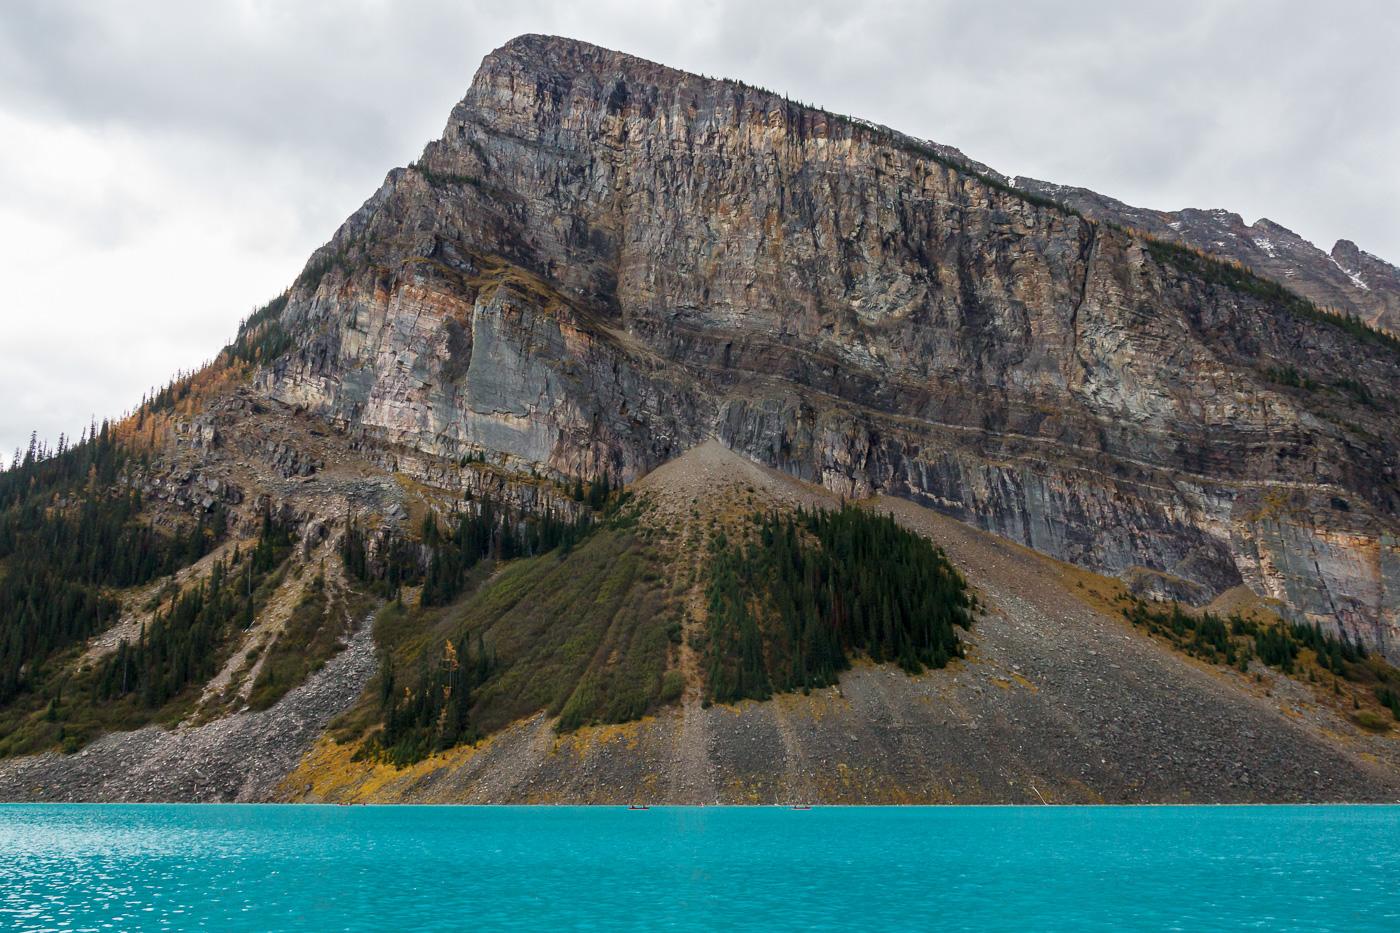 Lake Louise and geological features - Paisatges de Nord-Amèrica - Raül Carmona - Fotografia, Fotografia d'estudi, esdeveniments i Natura